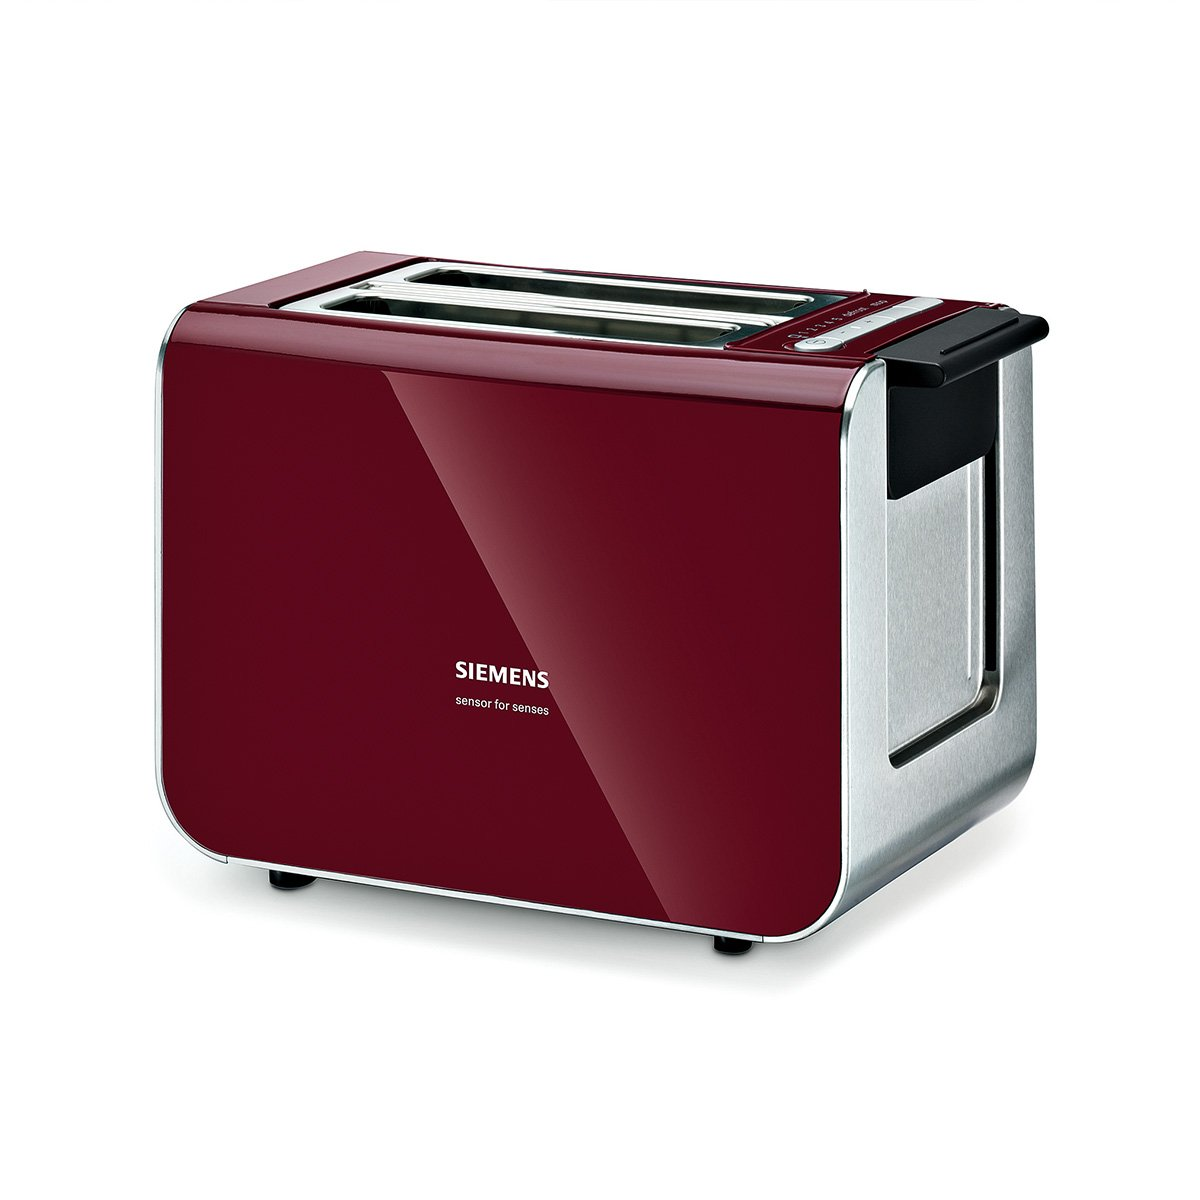 Siemens-Siemens-Kompakt-Toaster-TT86103